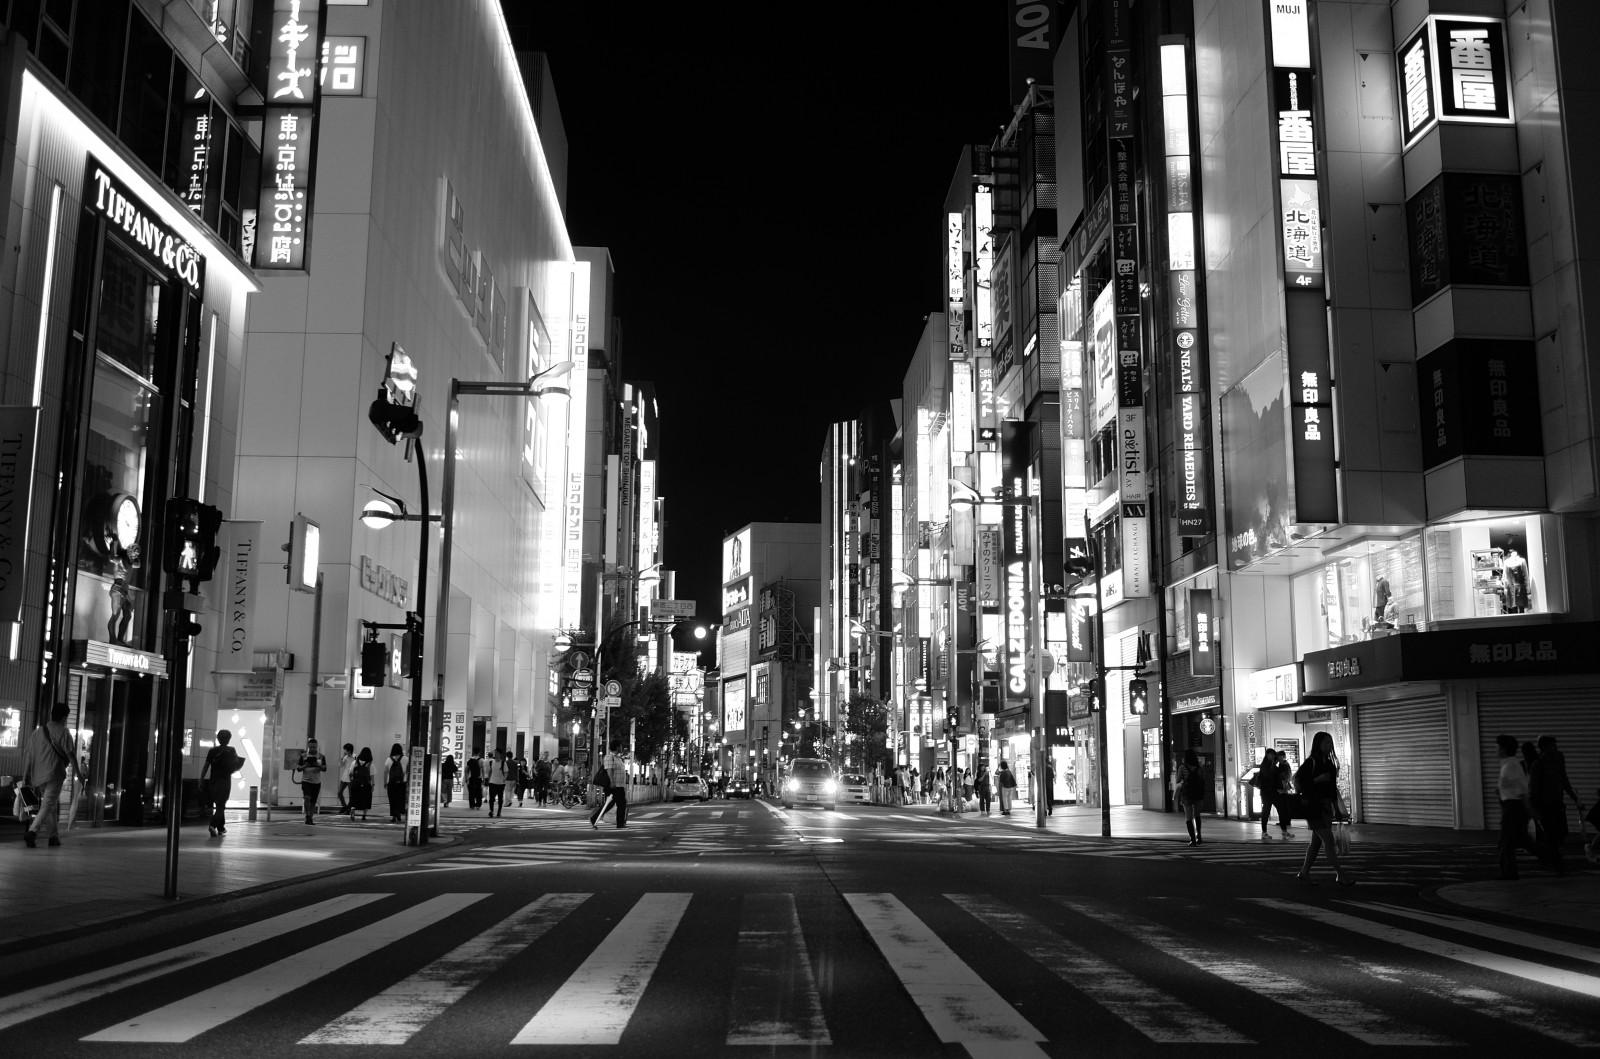 Wallpaper : Japan, street, cityscape, night, road ...